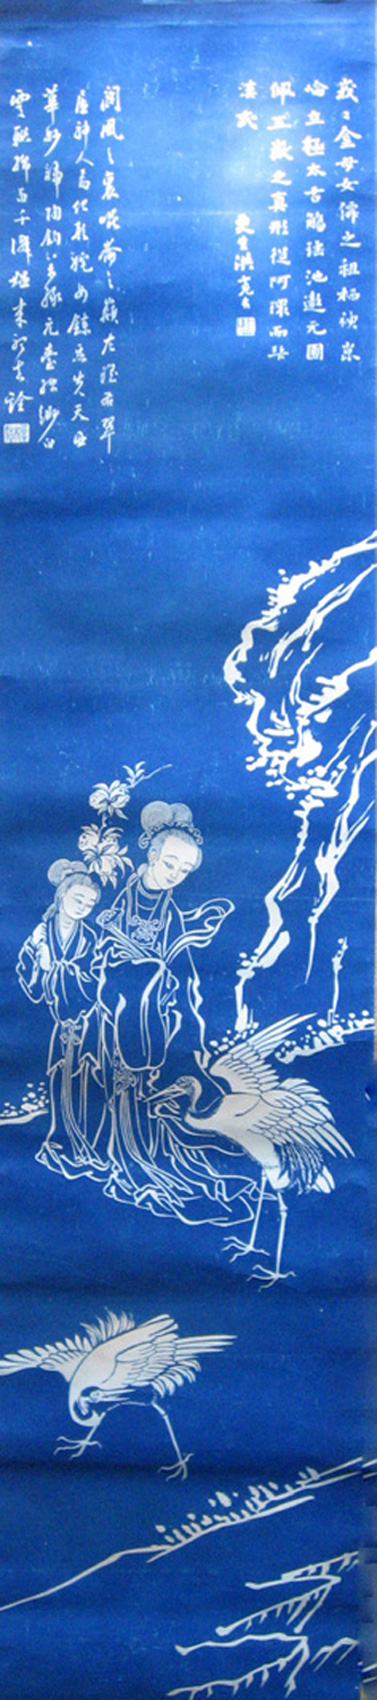 Estampage en bleu monté en rouleau. Blue rubbing mounted on scroll